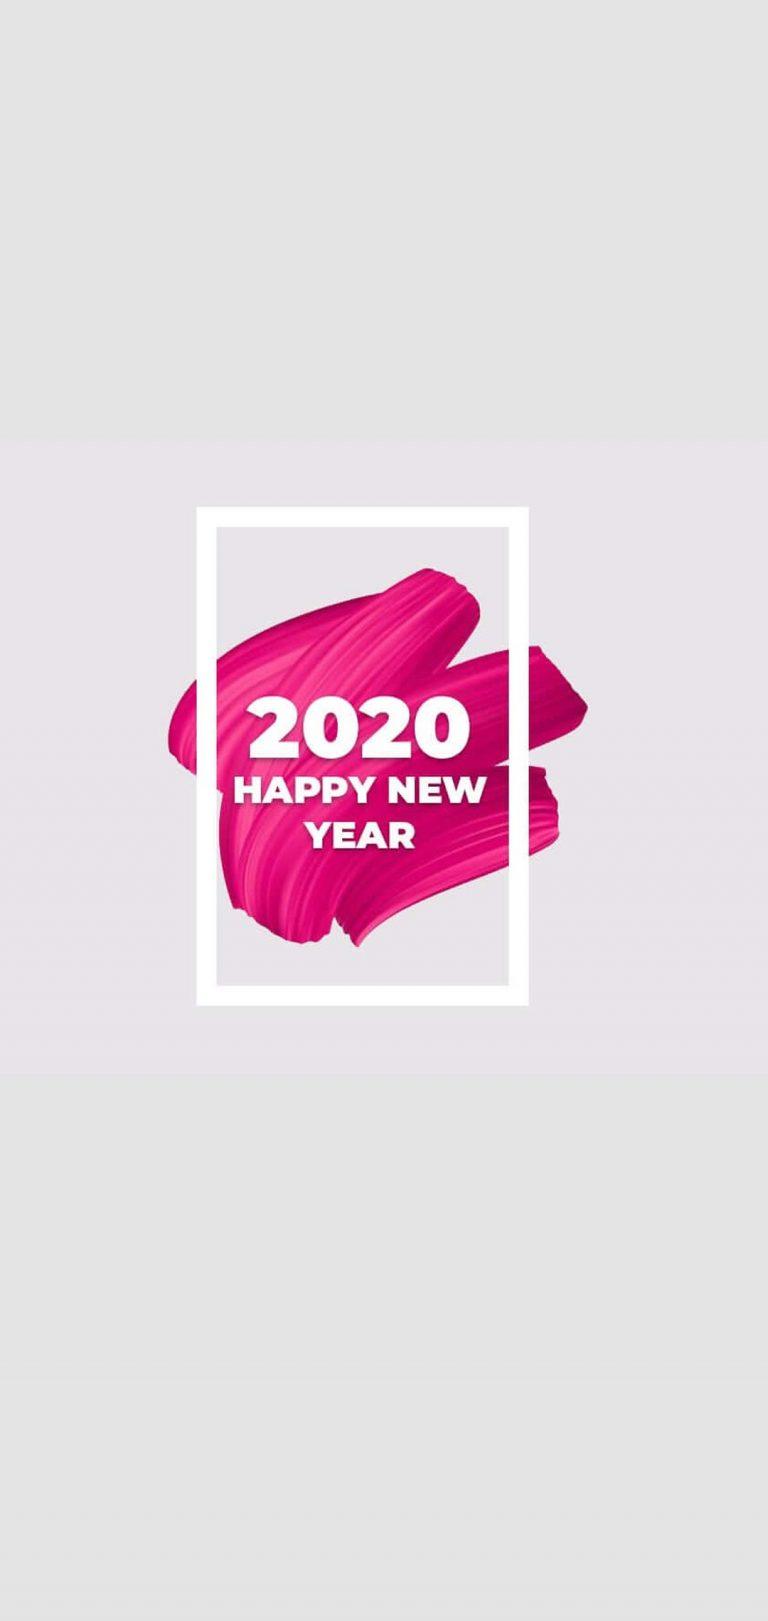 Happy New Year 2020 Phone Wallpaper 21 - [1080x2280]